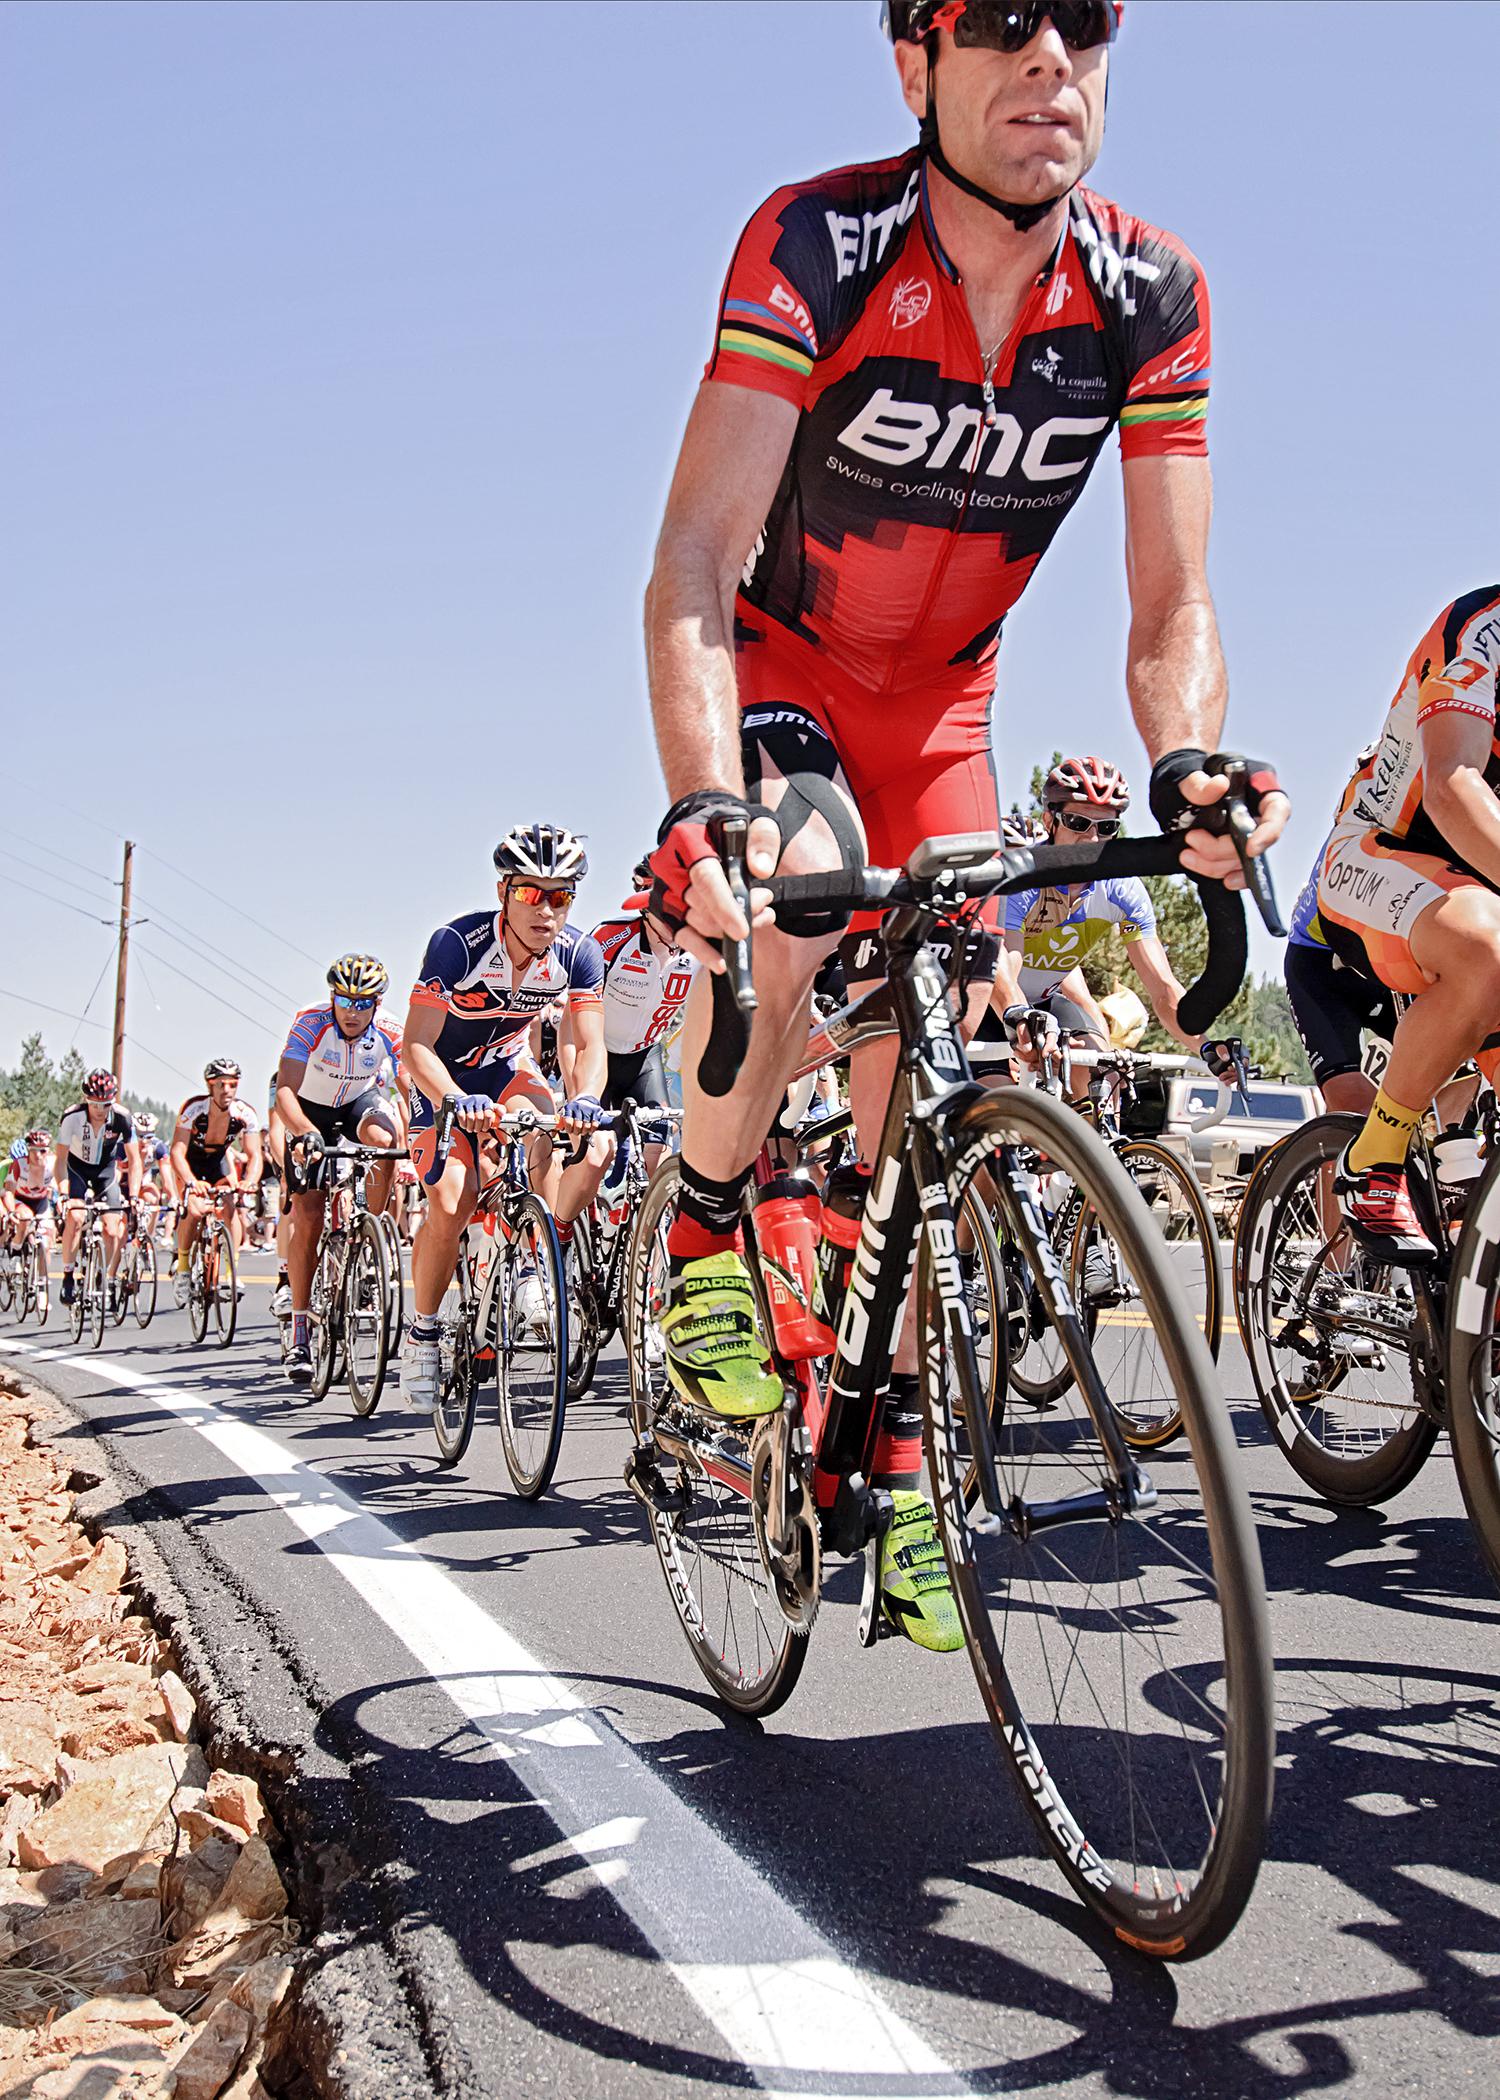 Cadel Evans and the peloton climbing Boulder Canyon during the Tour of Colorado. Nederland, CO